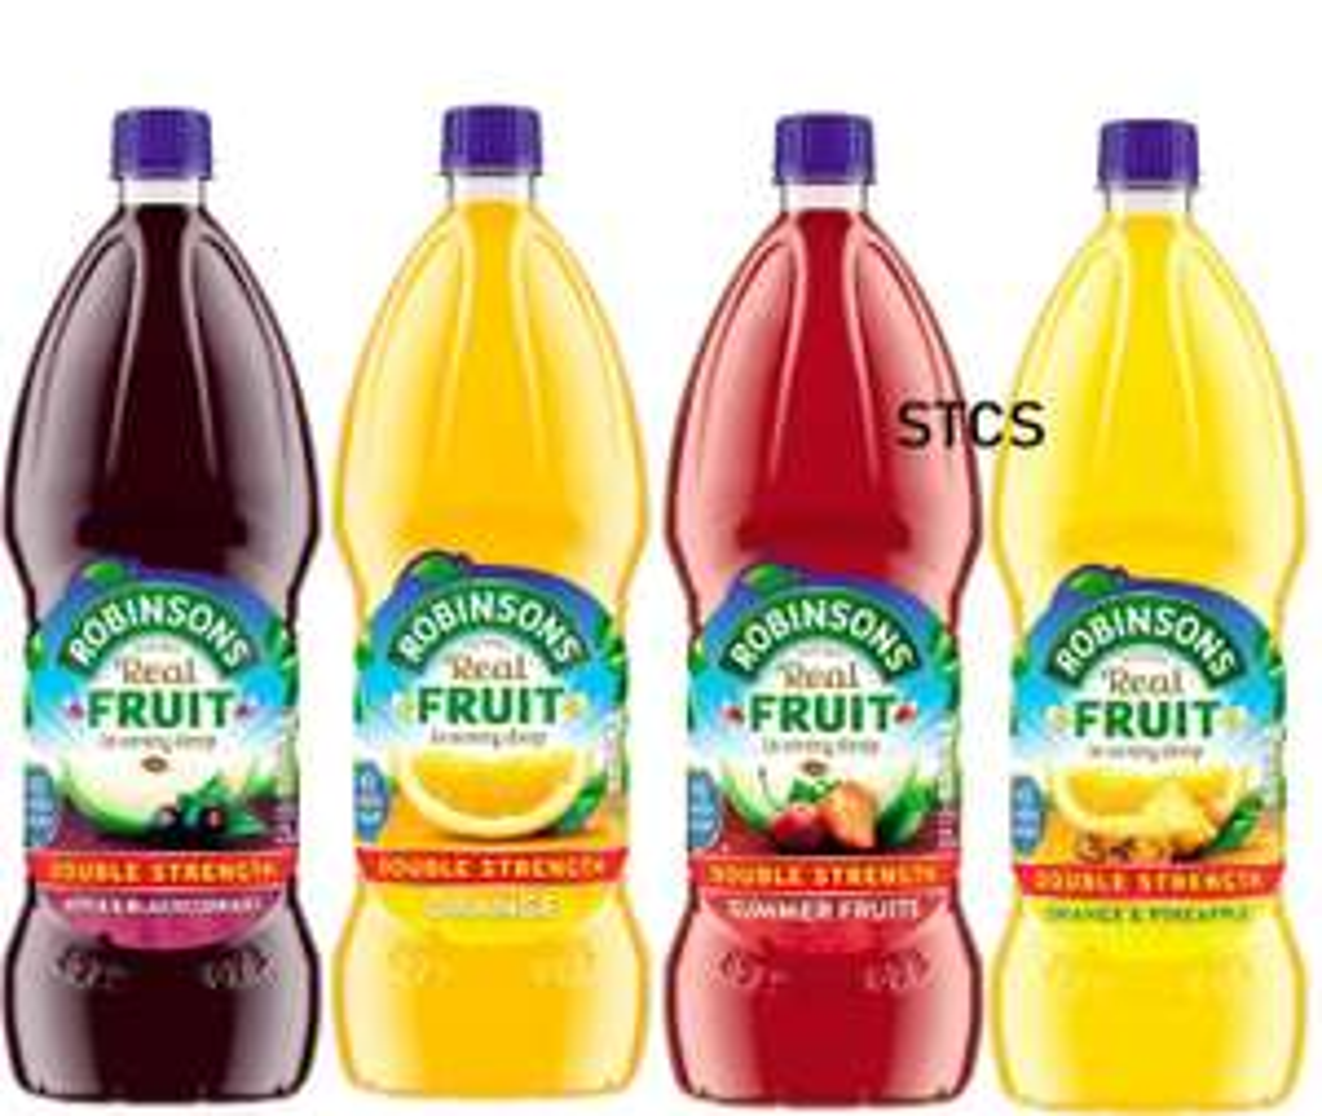 Robinsons Fruit Squash 1.75L Double Concentrate - £1.50 Prime / +£4.49 non Prime @ Amazon